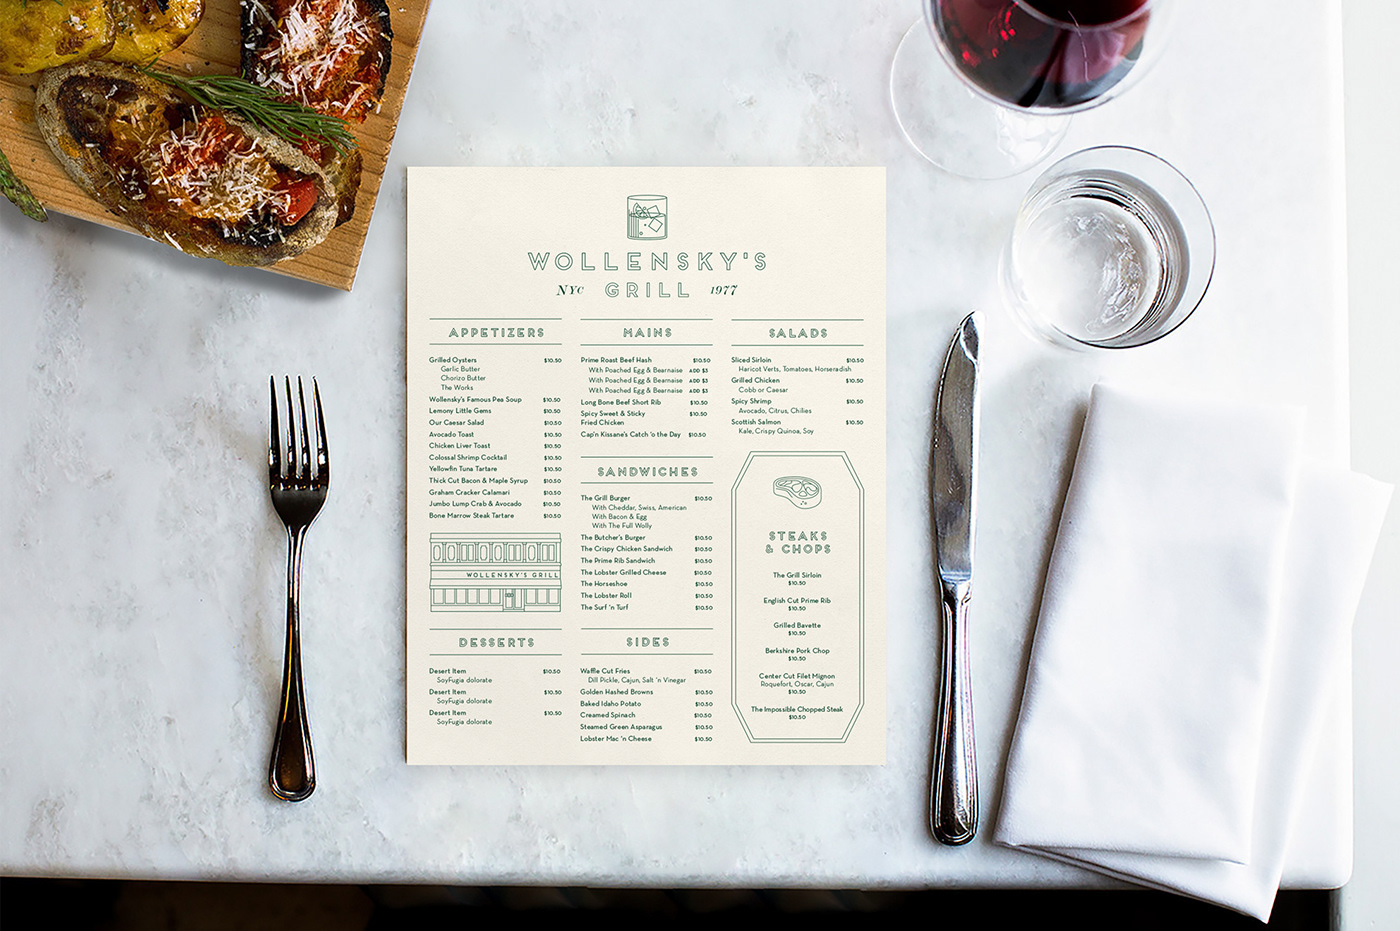 Image may contain: indoor, tableware and menu